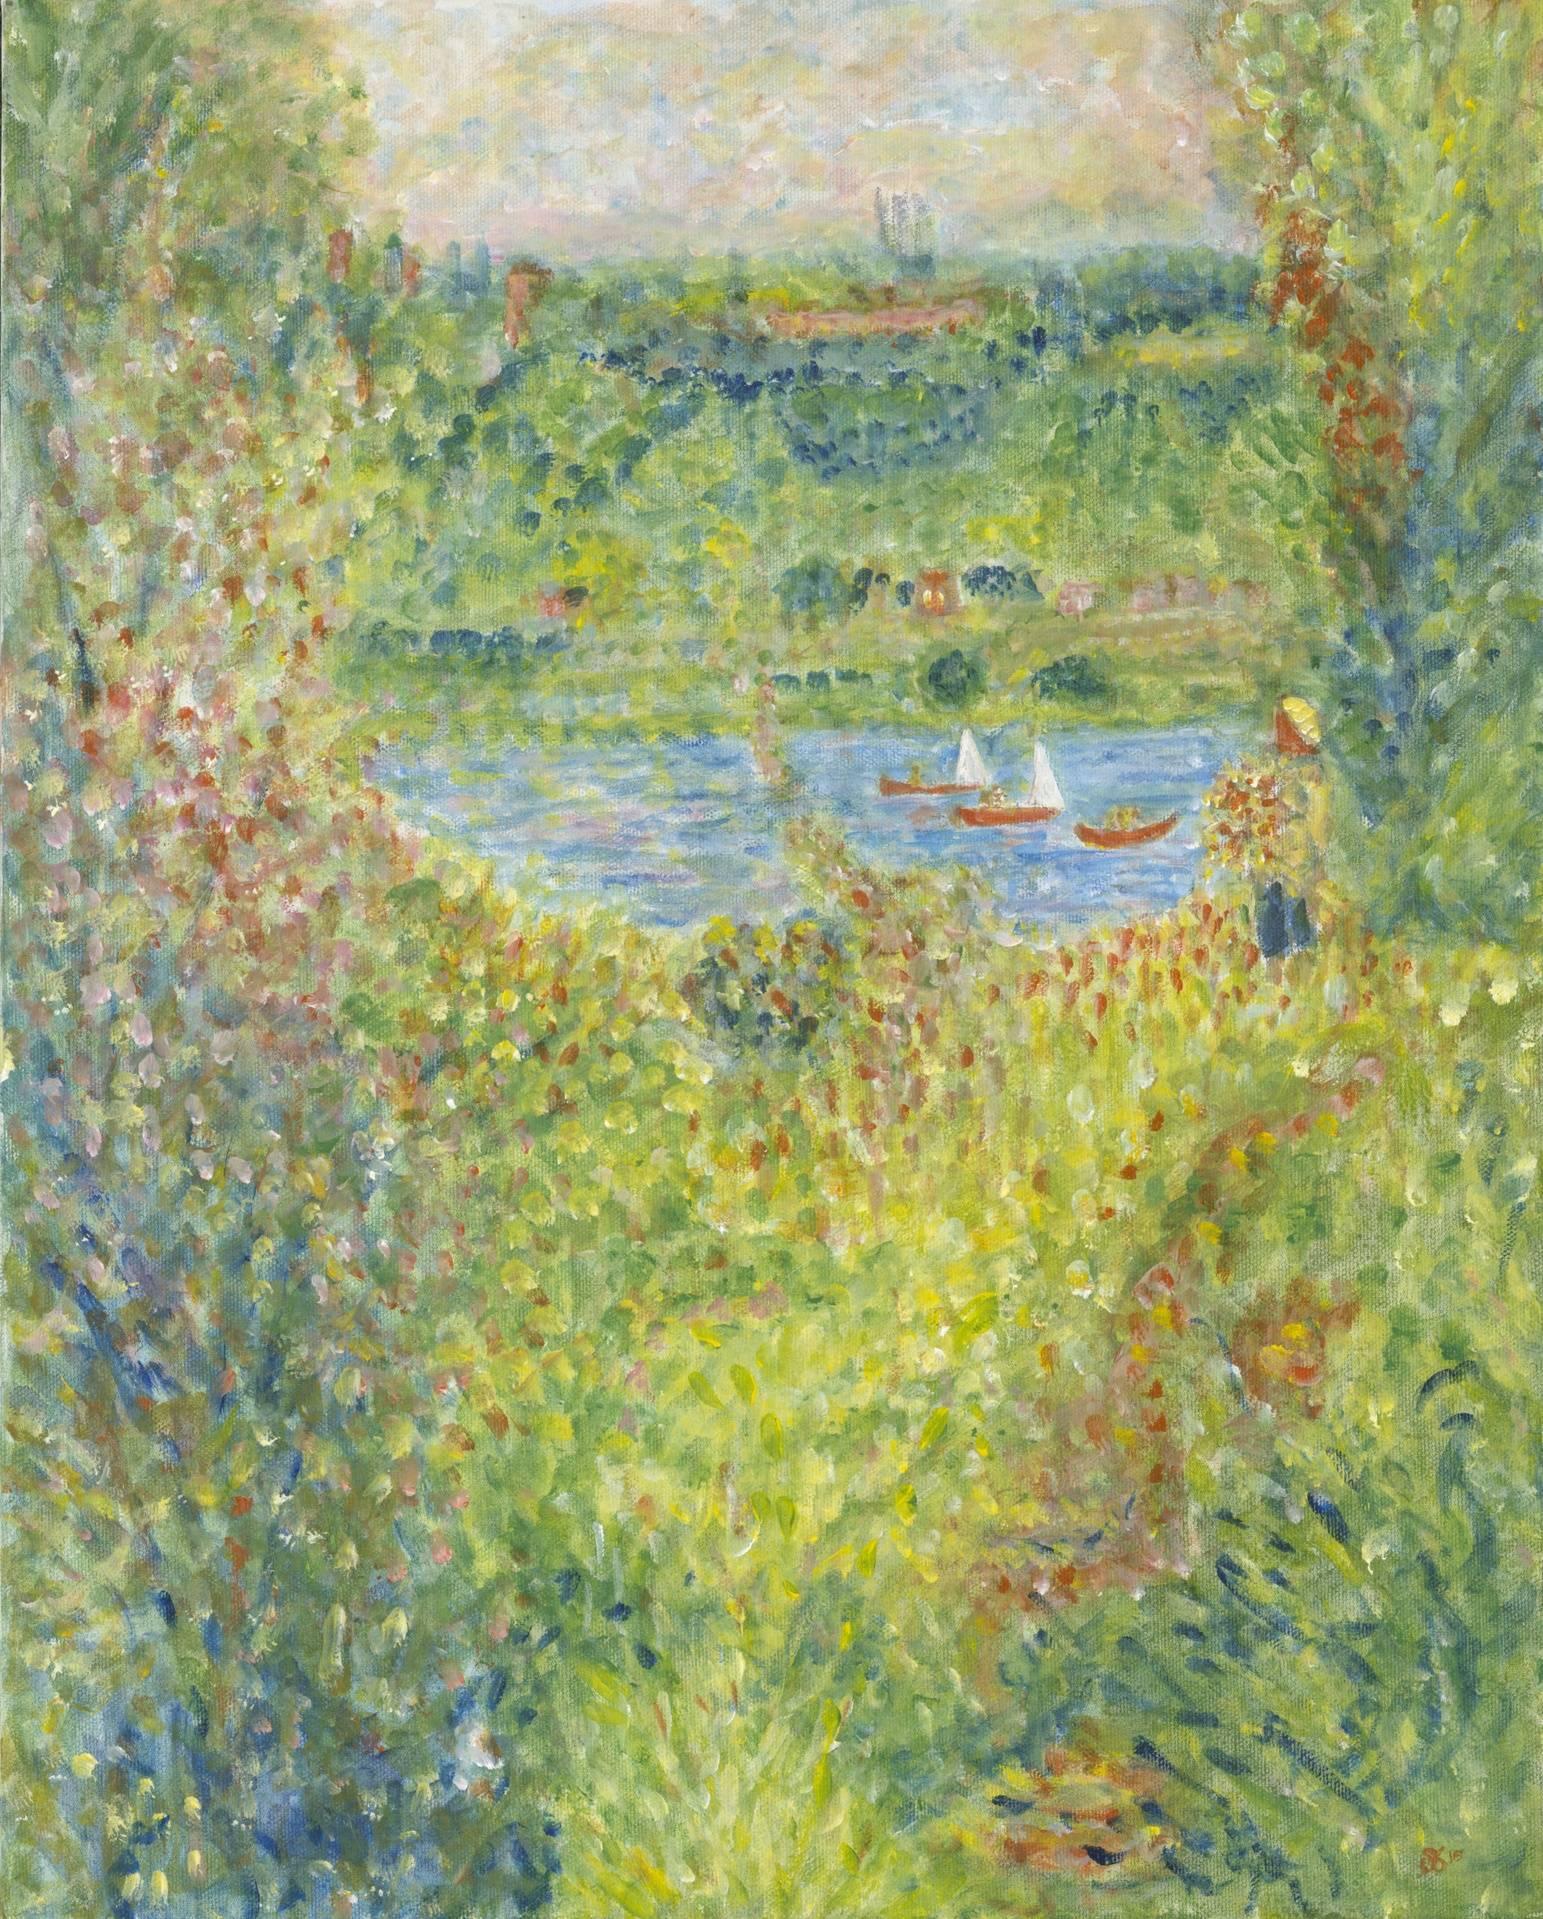 Interpretation of The Seine at Chatou by Renoir